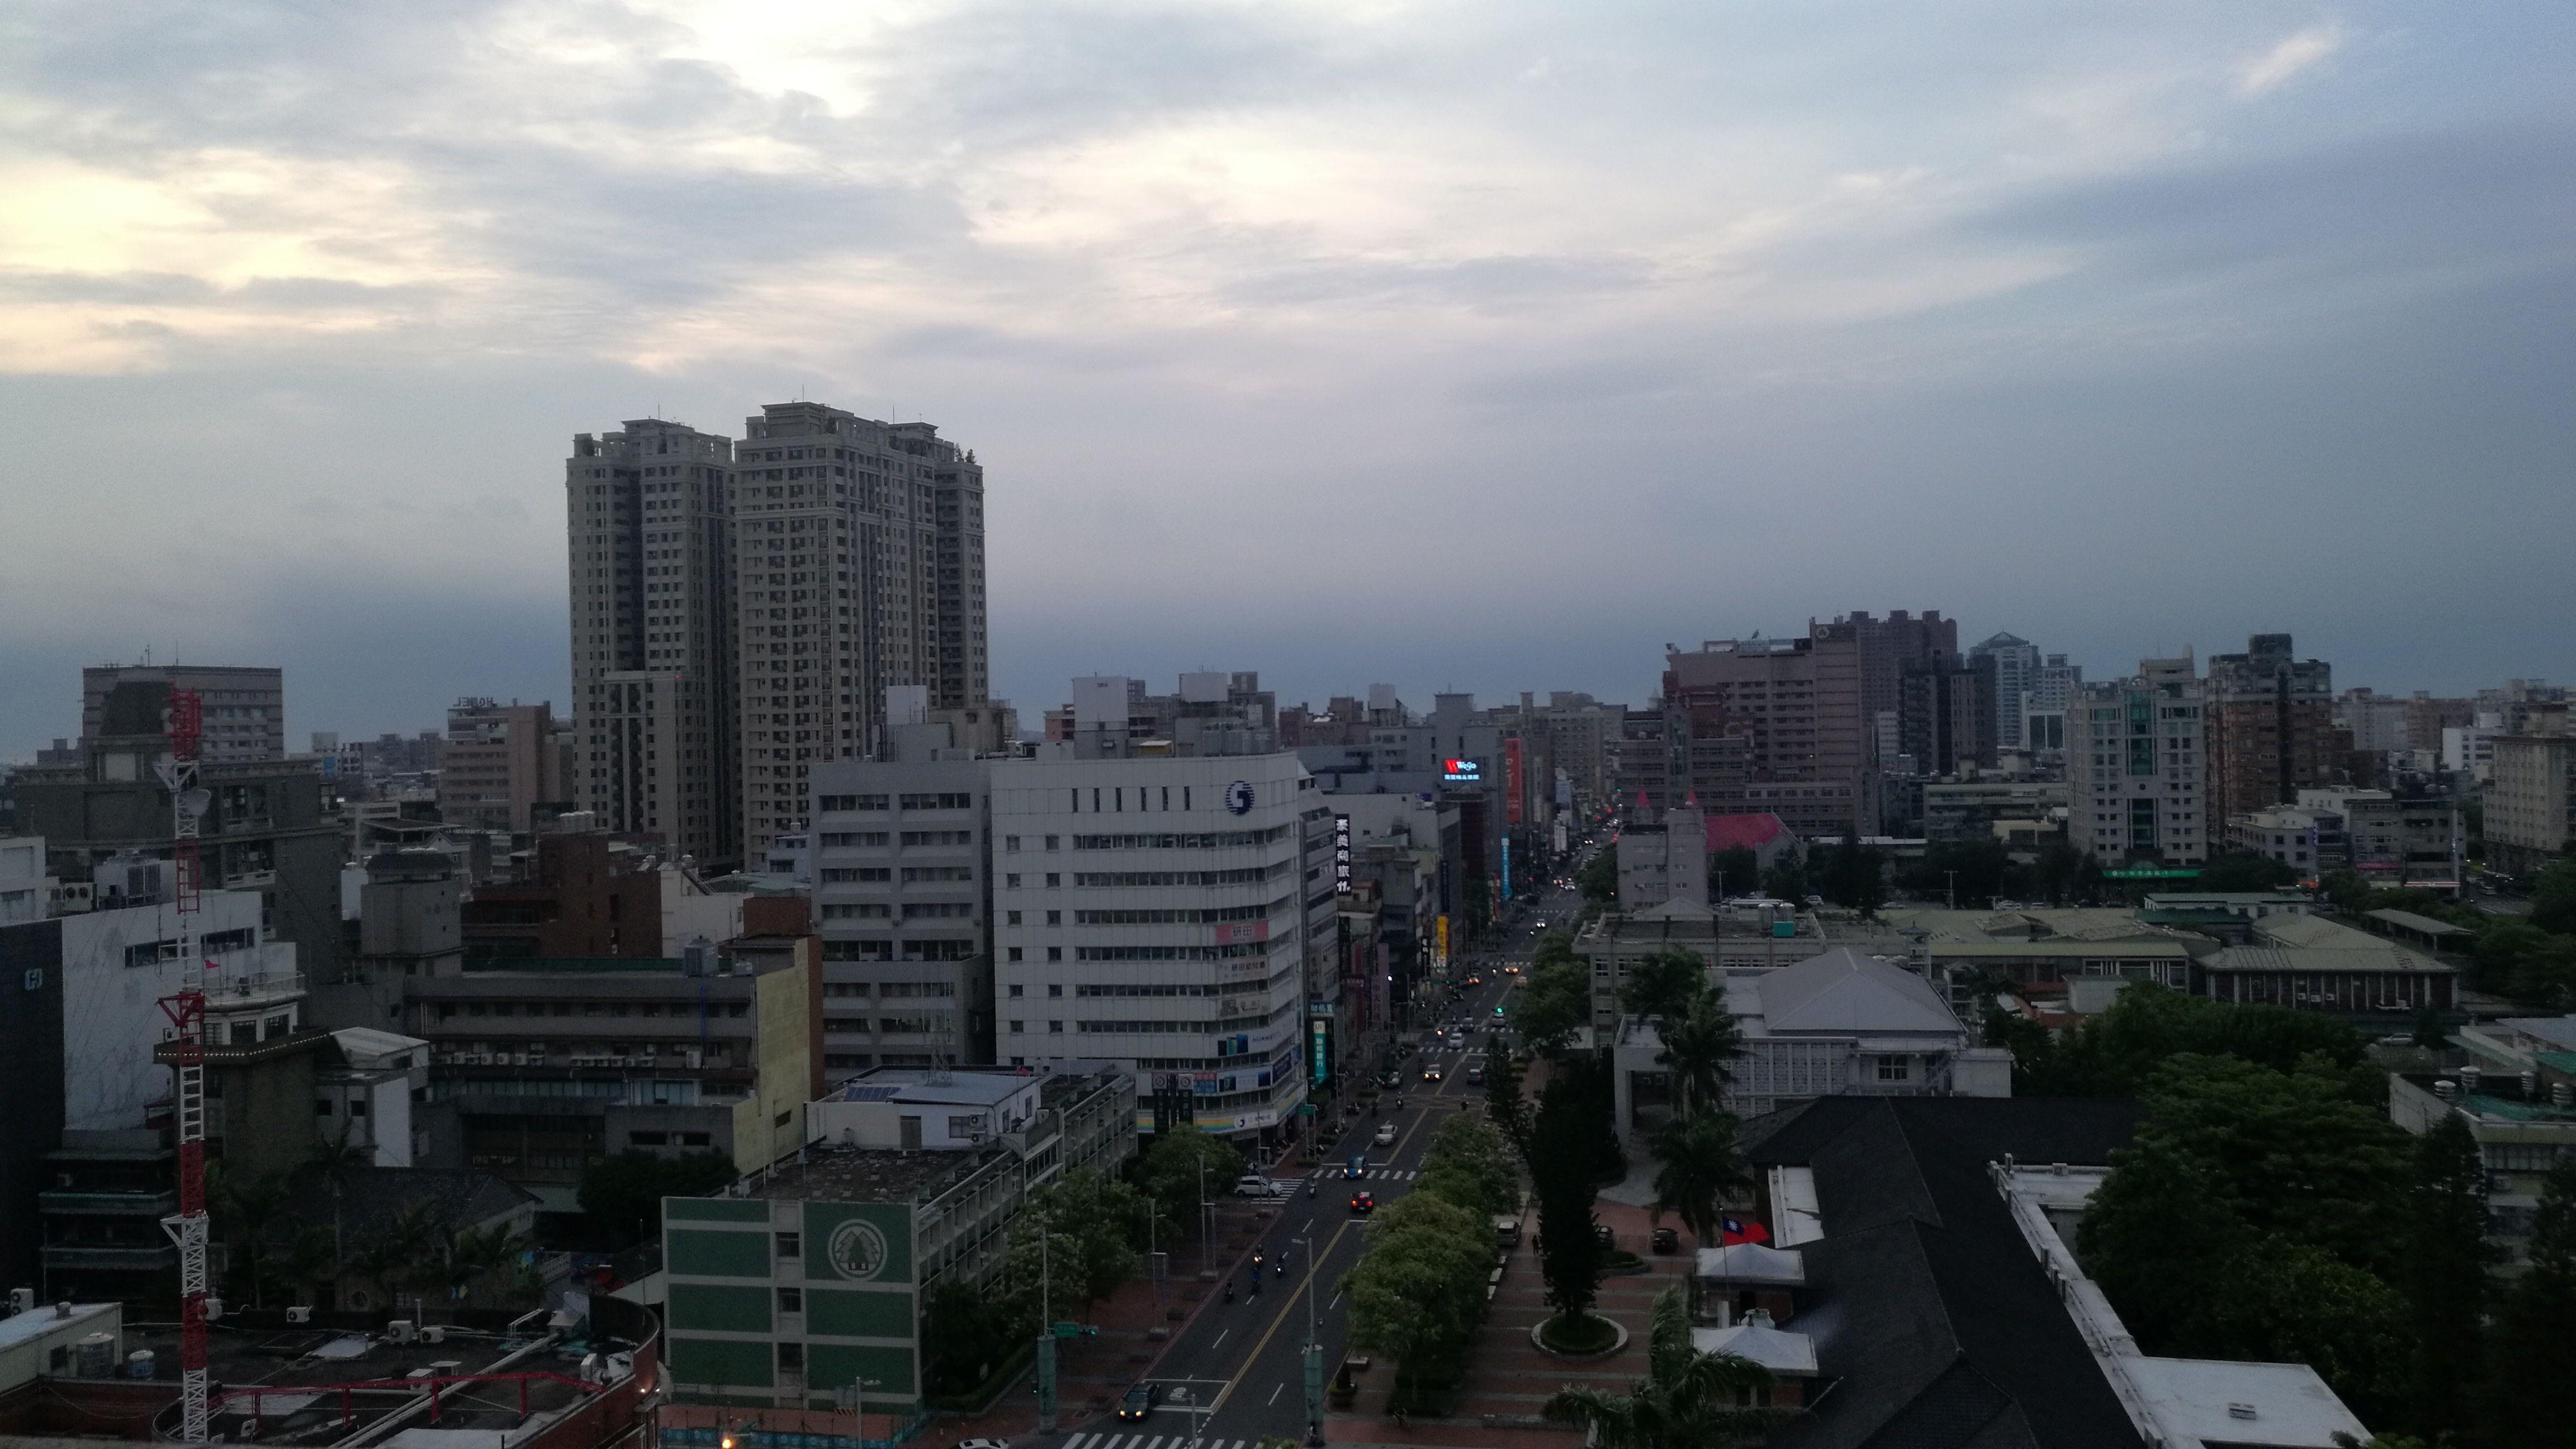 La selva de cemento de Hsinchu